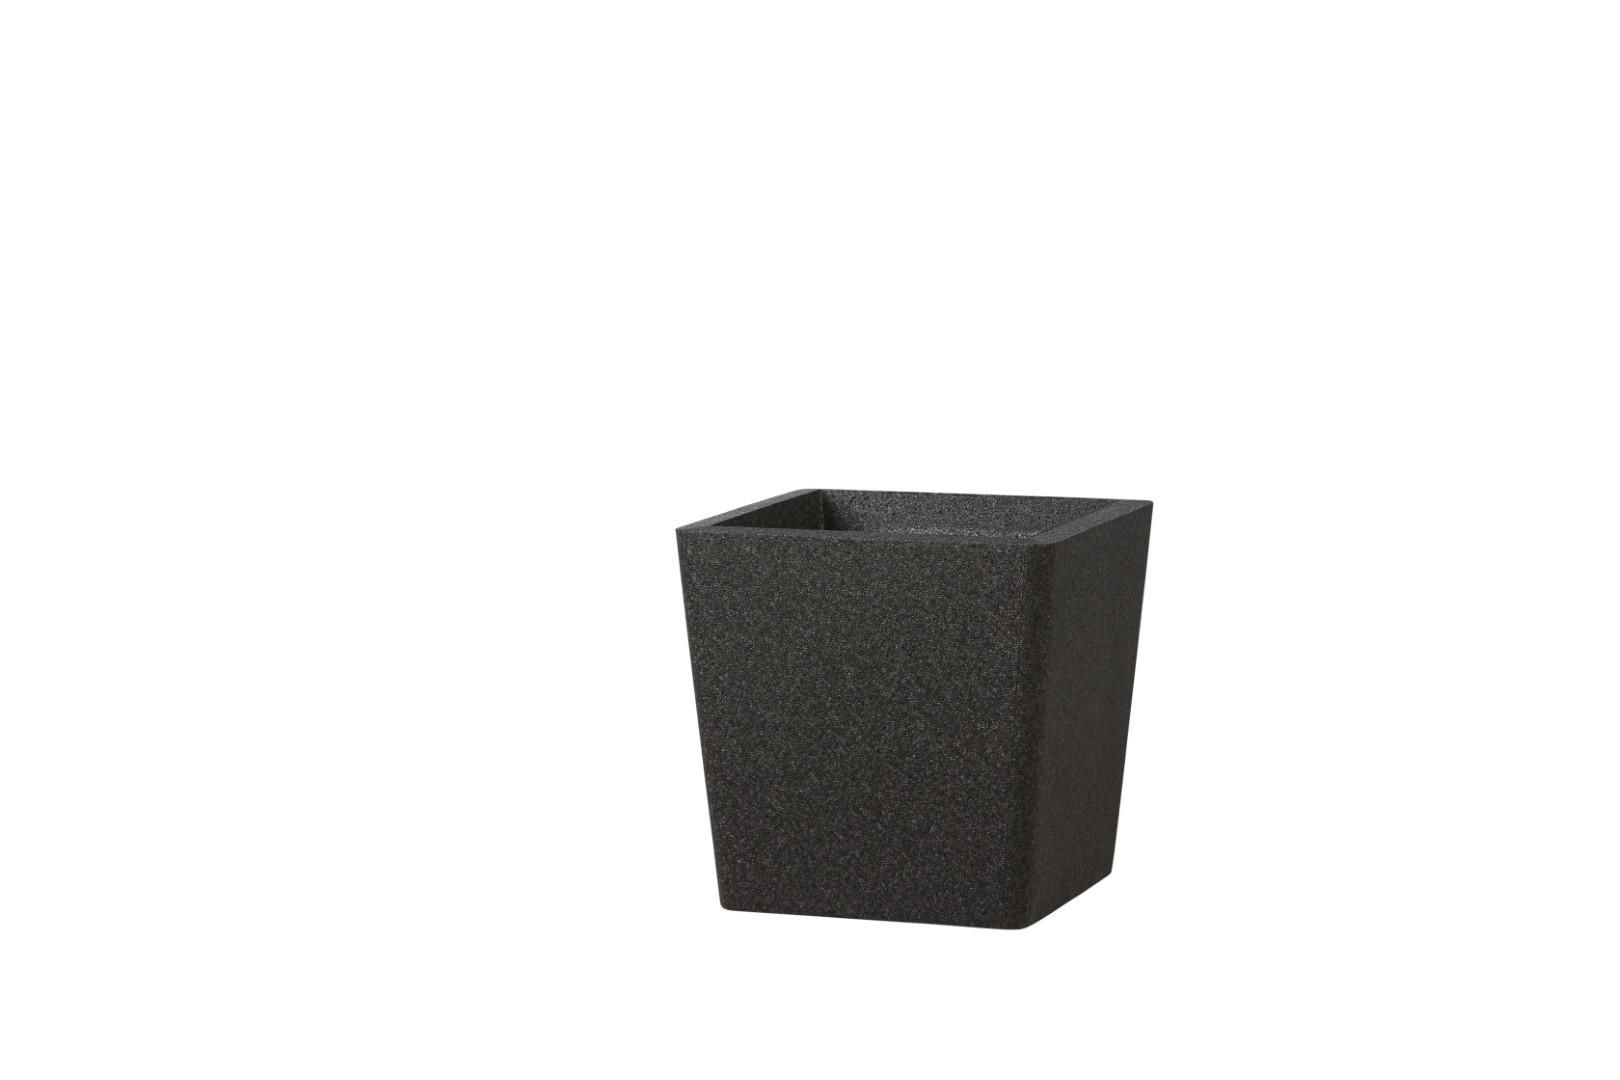 Iqbana pot conical black 32x32x32 cm